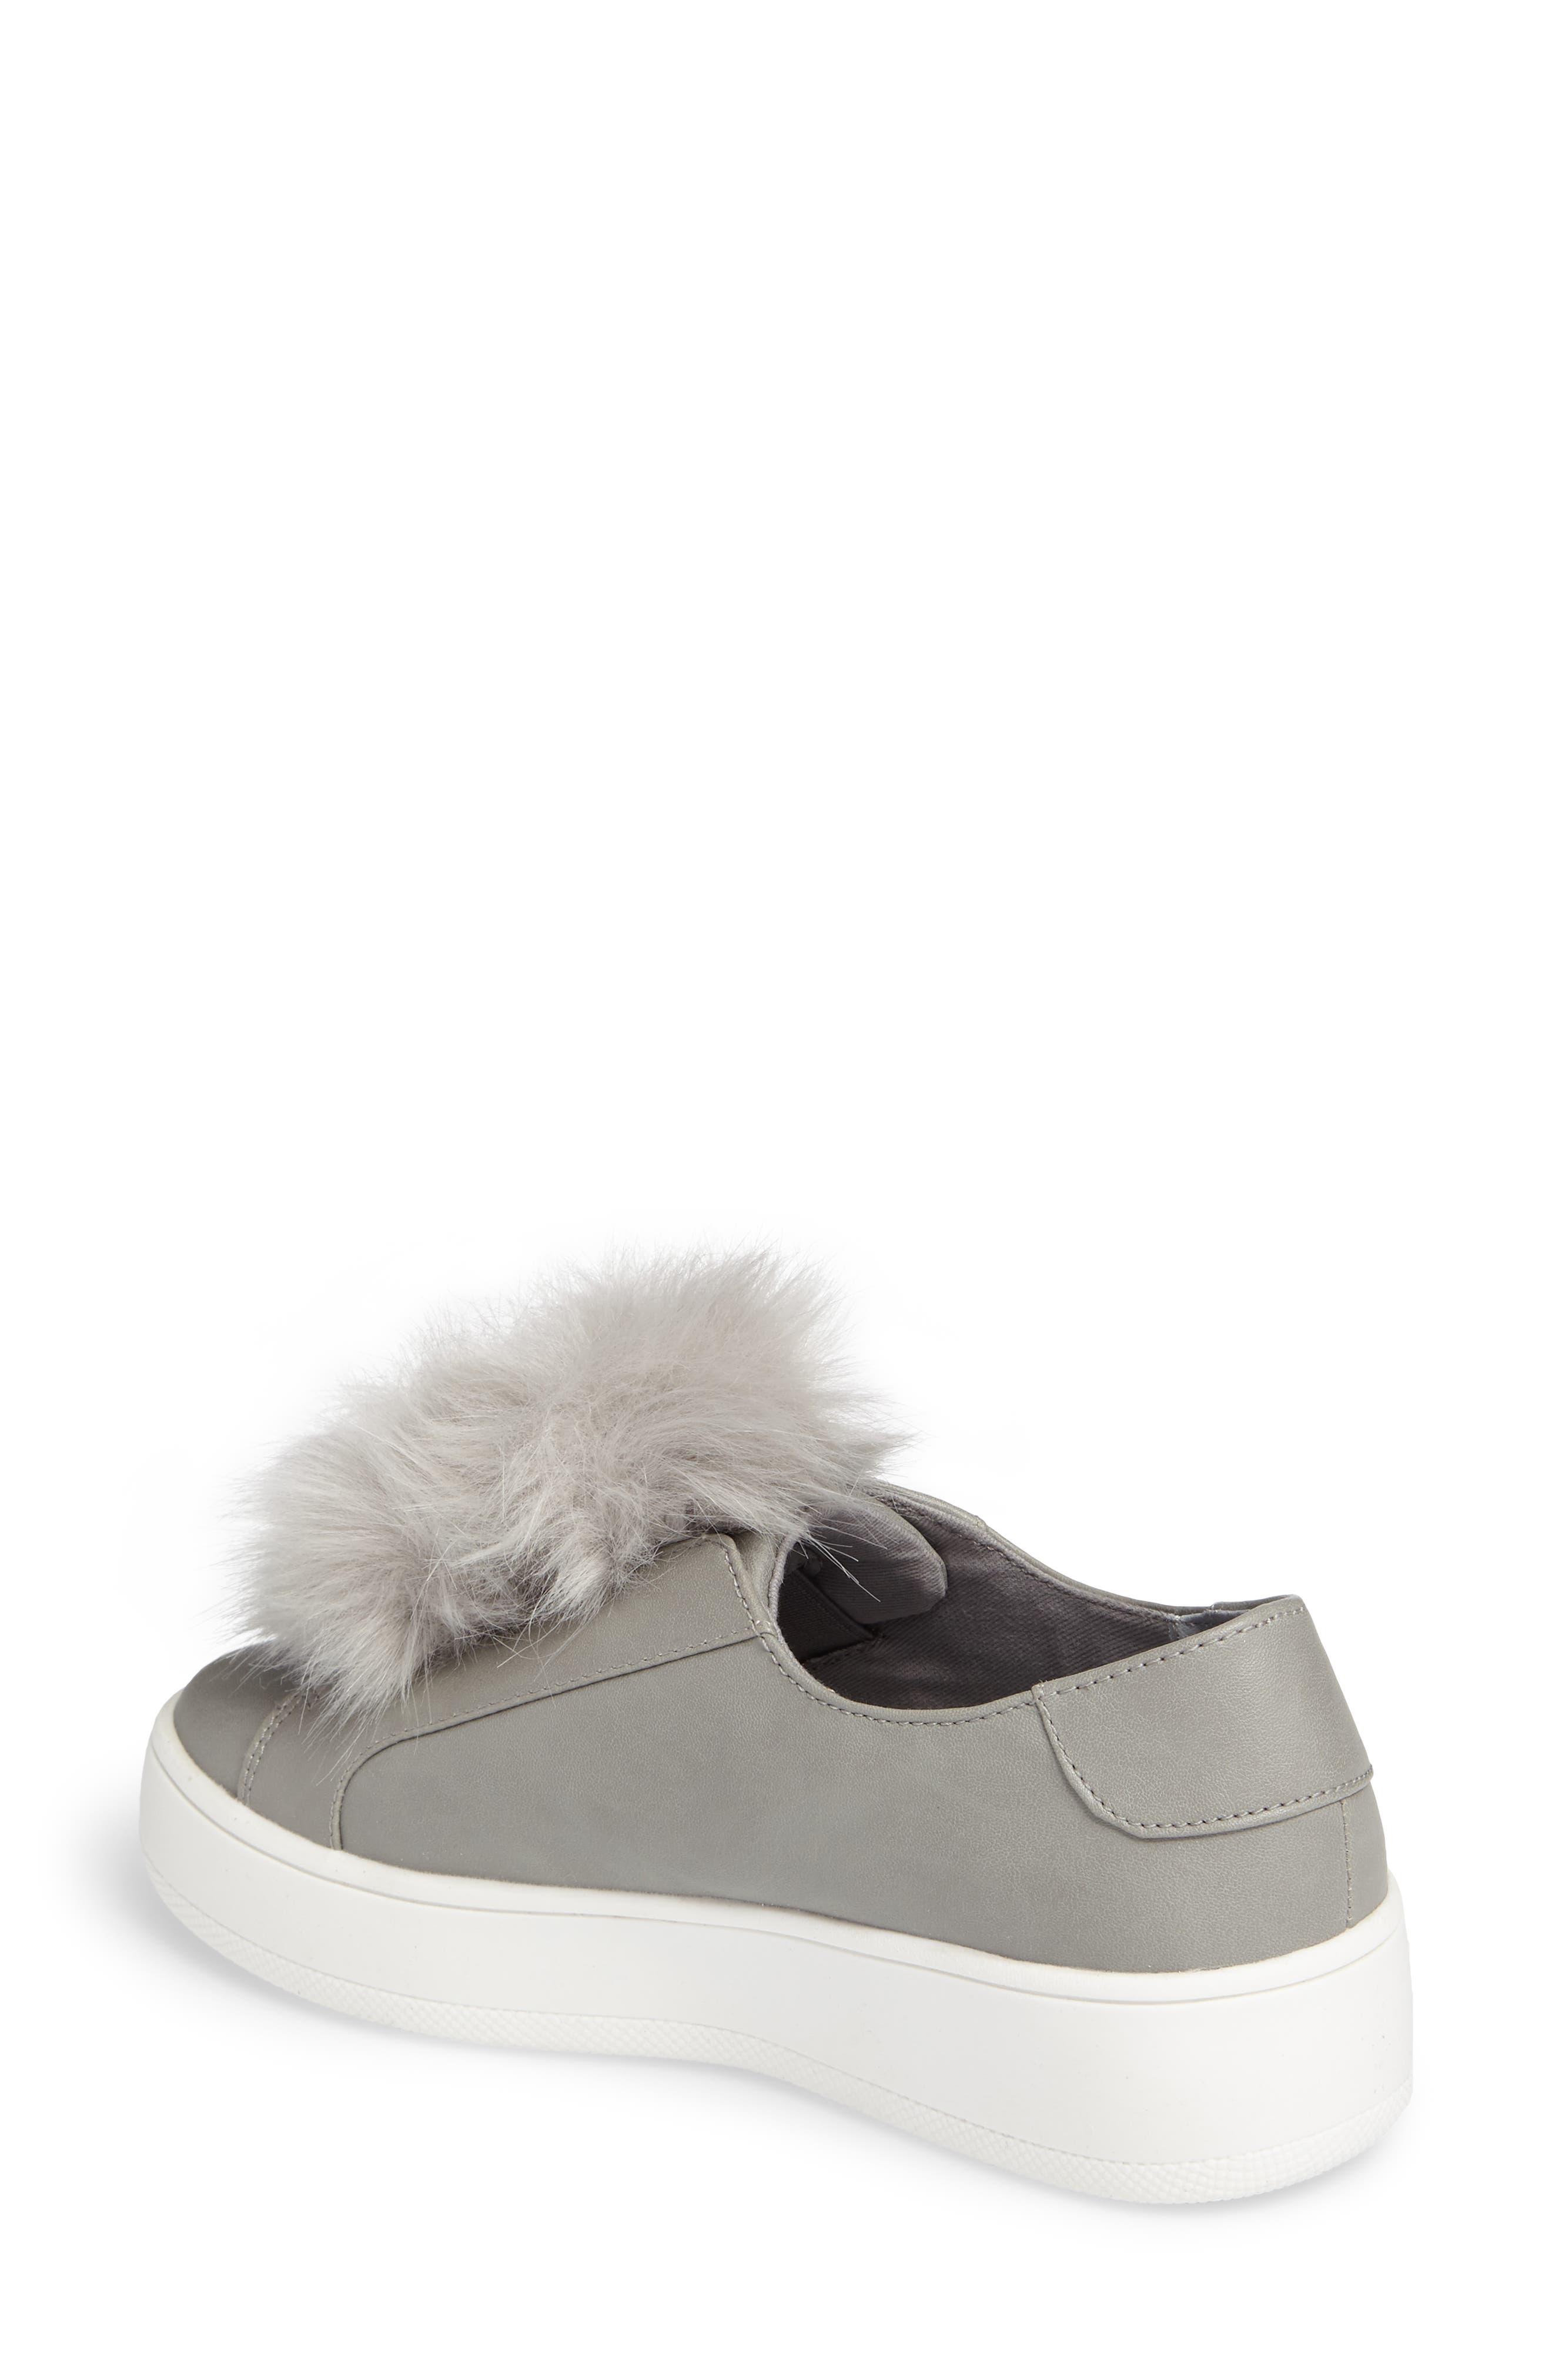 Breeze Faux Fur Pom Sneaker,                             Alternate thumbnail 2, color,                             Grey